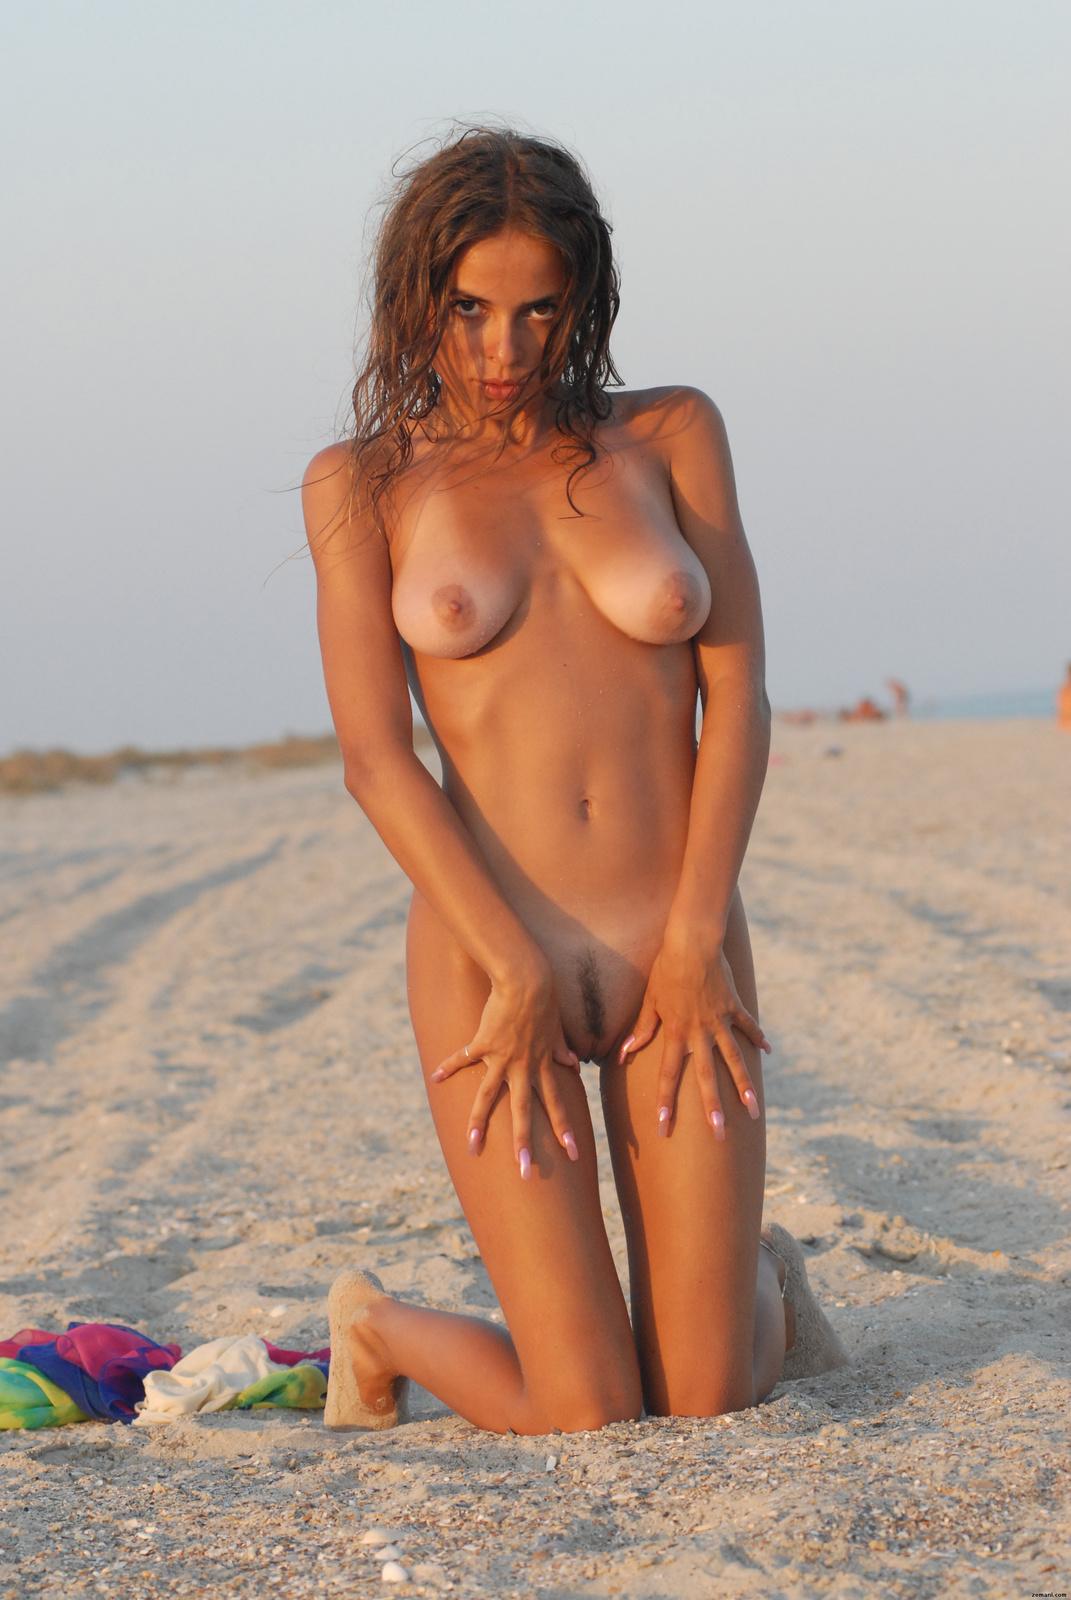 Zdjęcie porno - 021 - Naturalne piersi